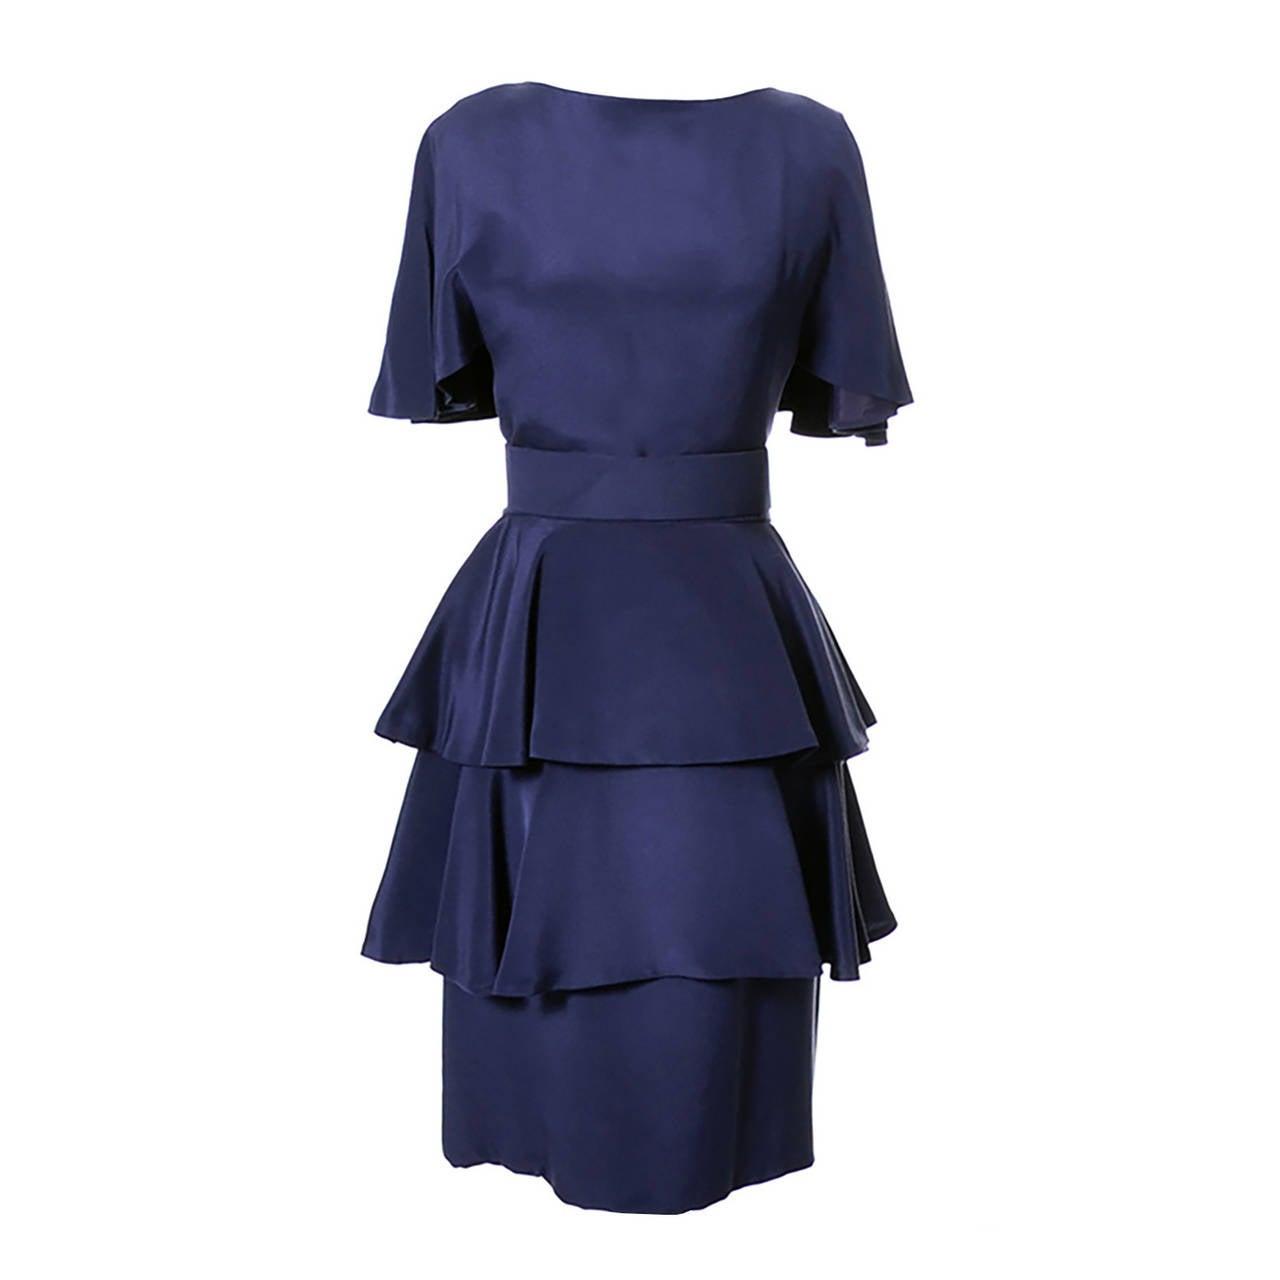 Scaasi Neiman Marcus Vintage Dress Royal Blue Silk 1980s at 1stdibs